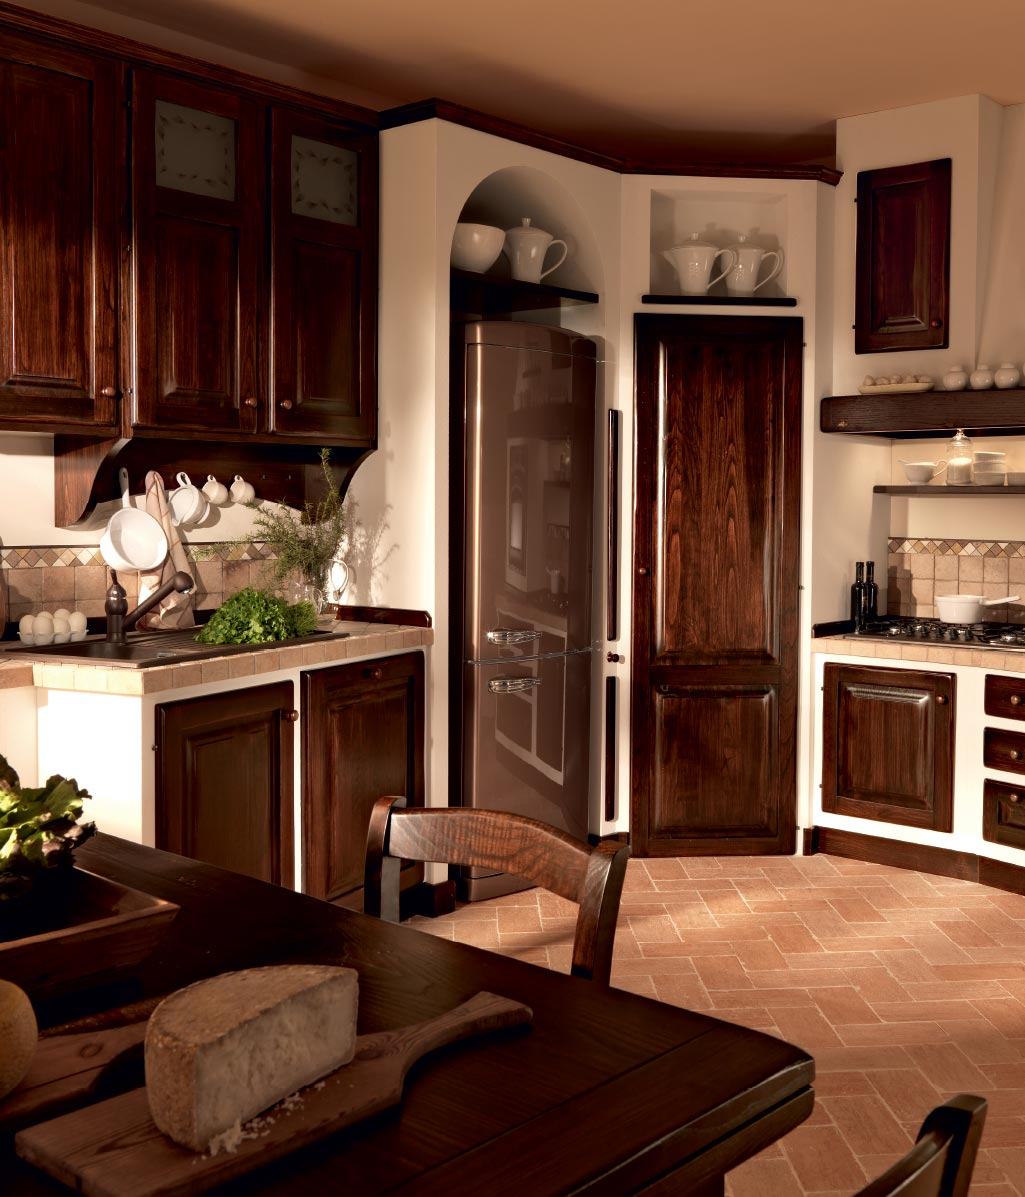 Cucine Muratura Country - Idee Per La Casa - Syafir.com